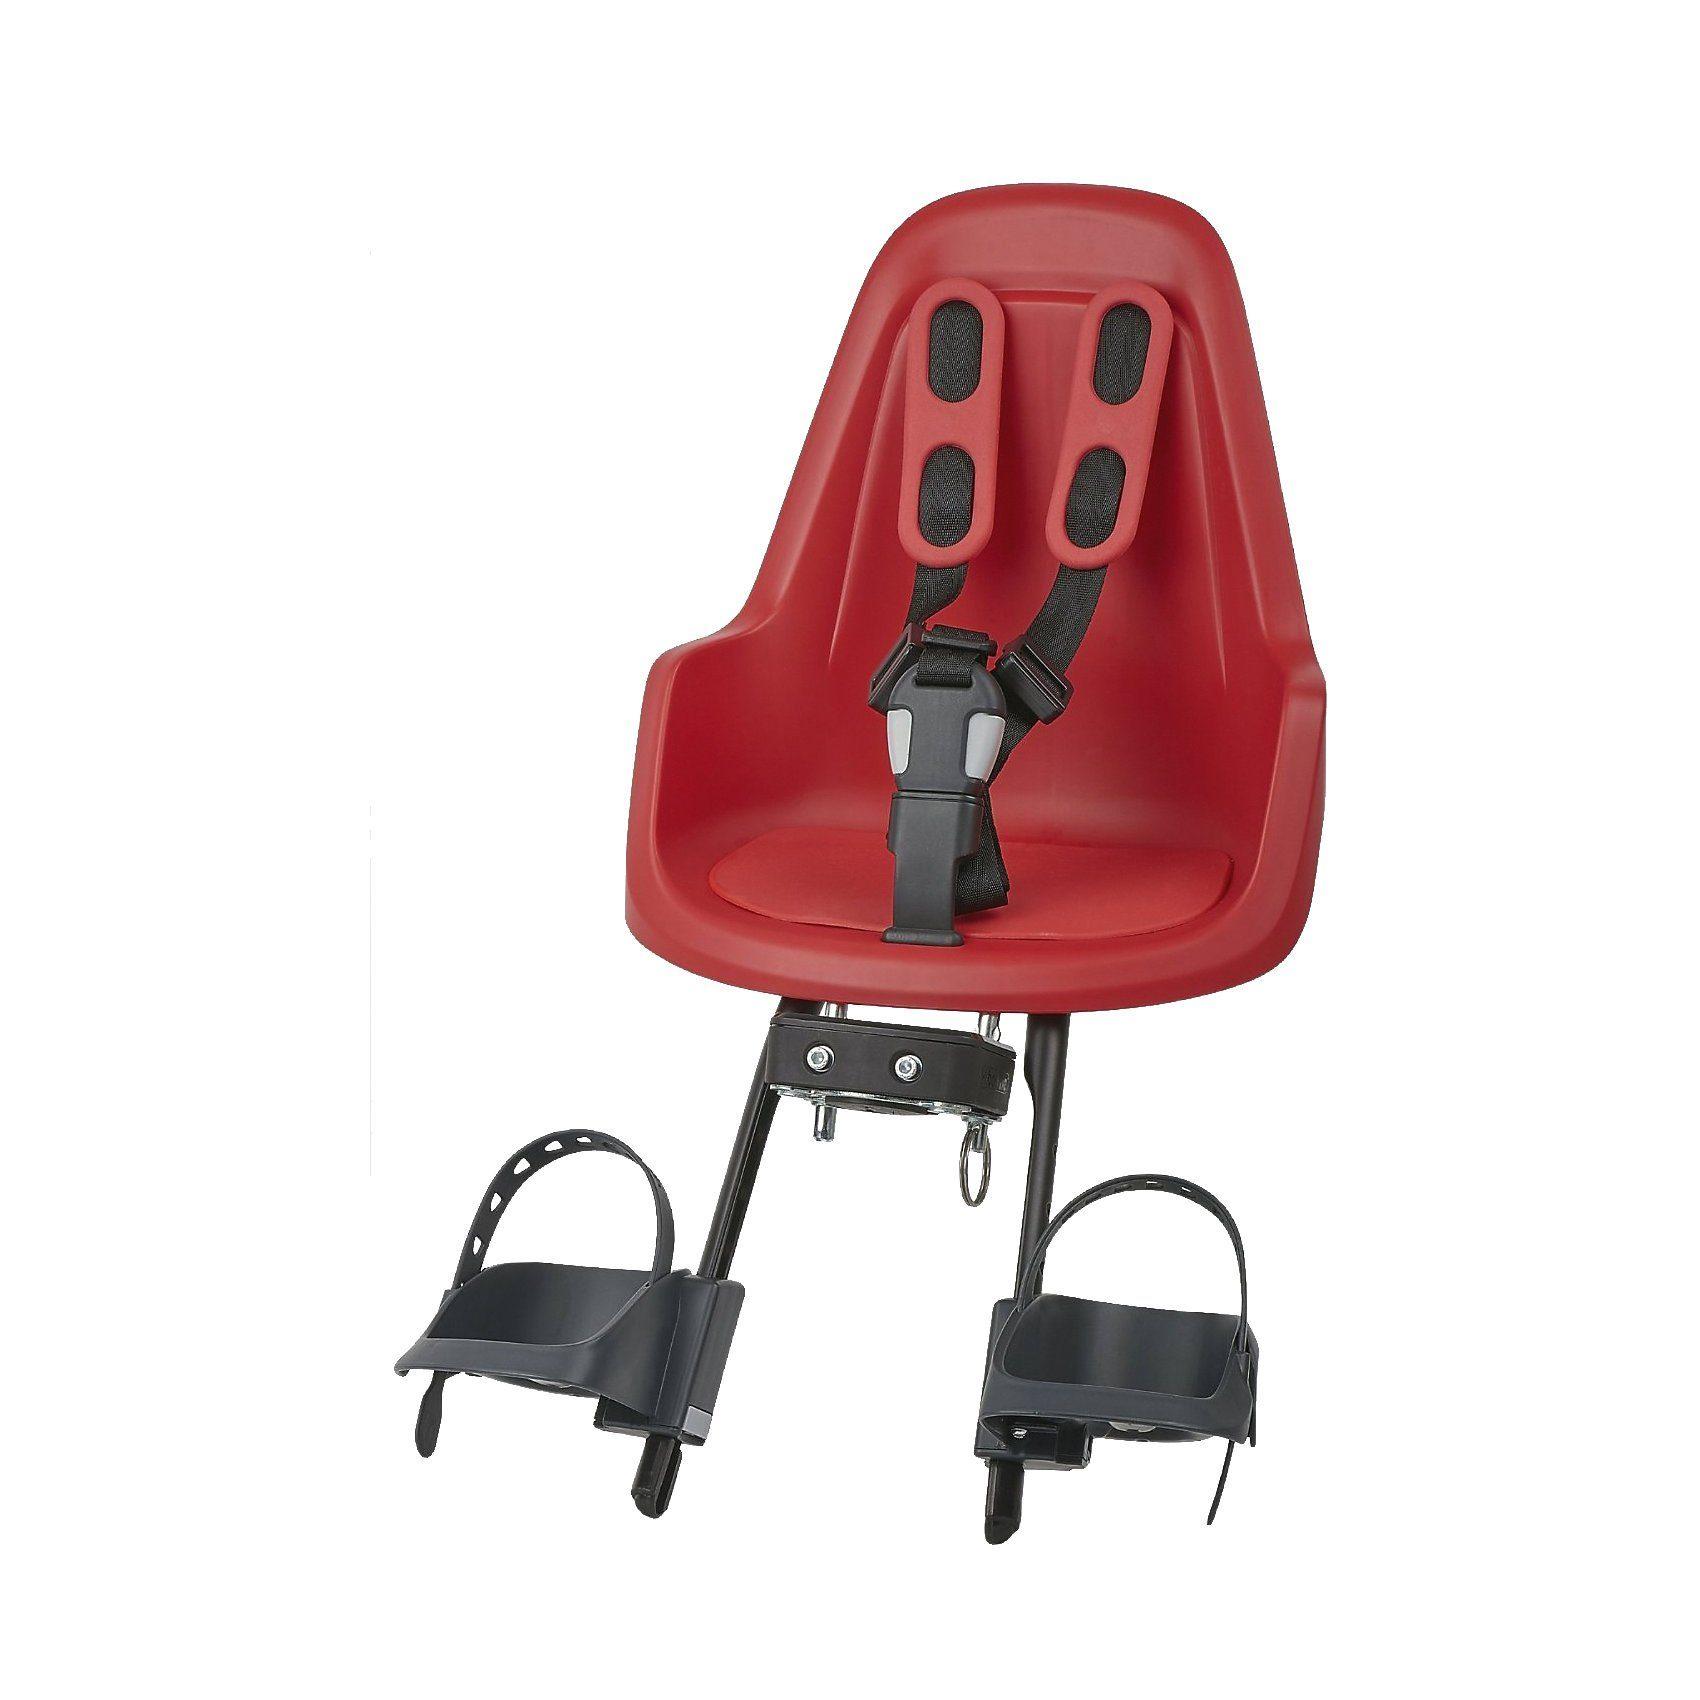 bobike Fahrrad-Sicherheitssitz Mini ONE, front, Strawberry Red